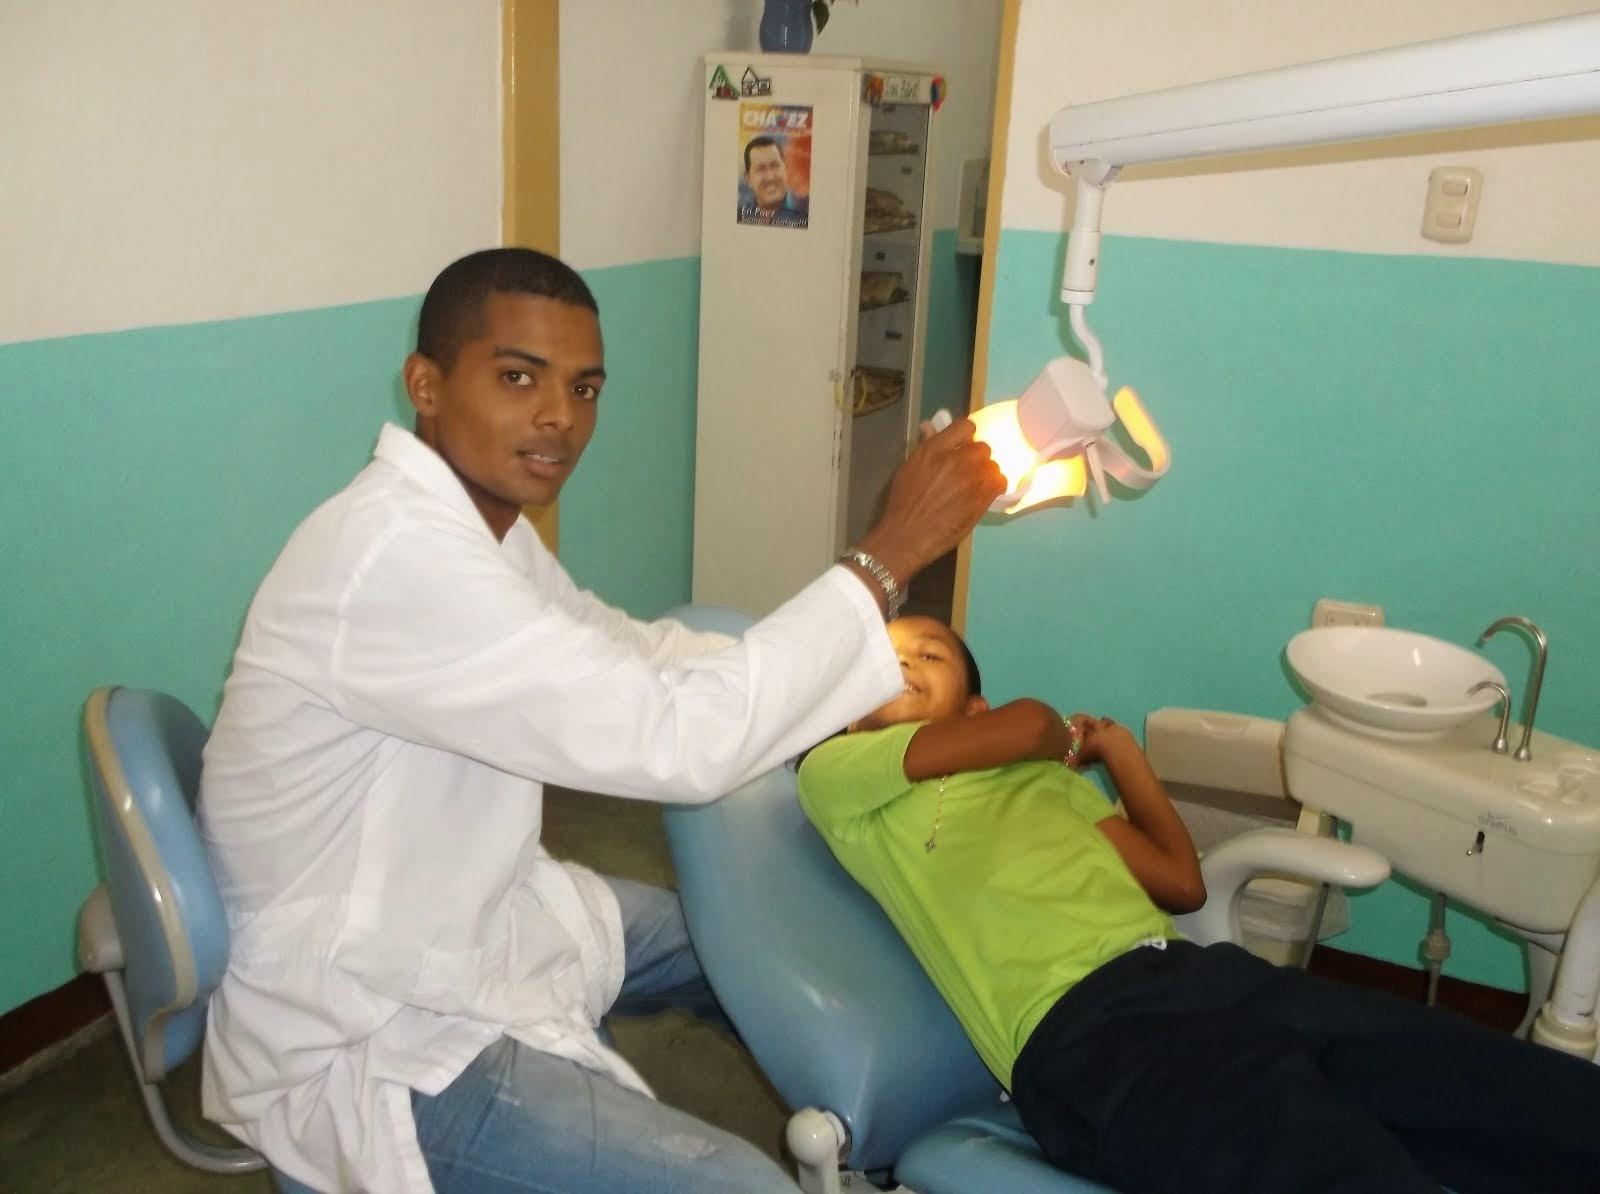 Médico Cubano de Barrio Adentro